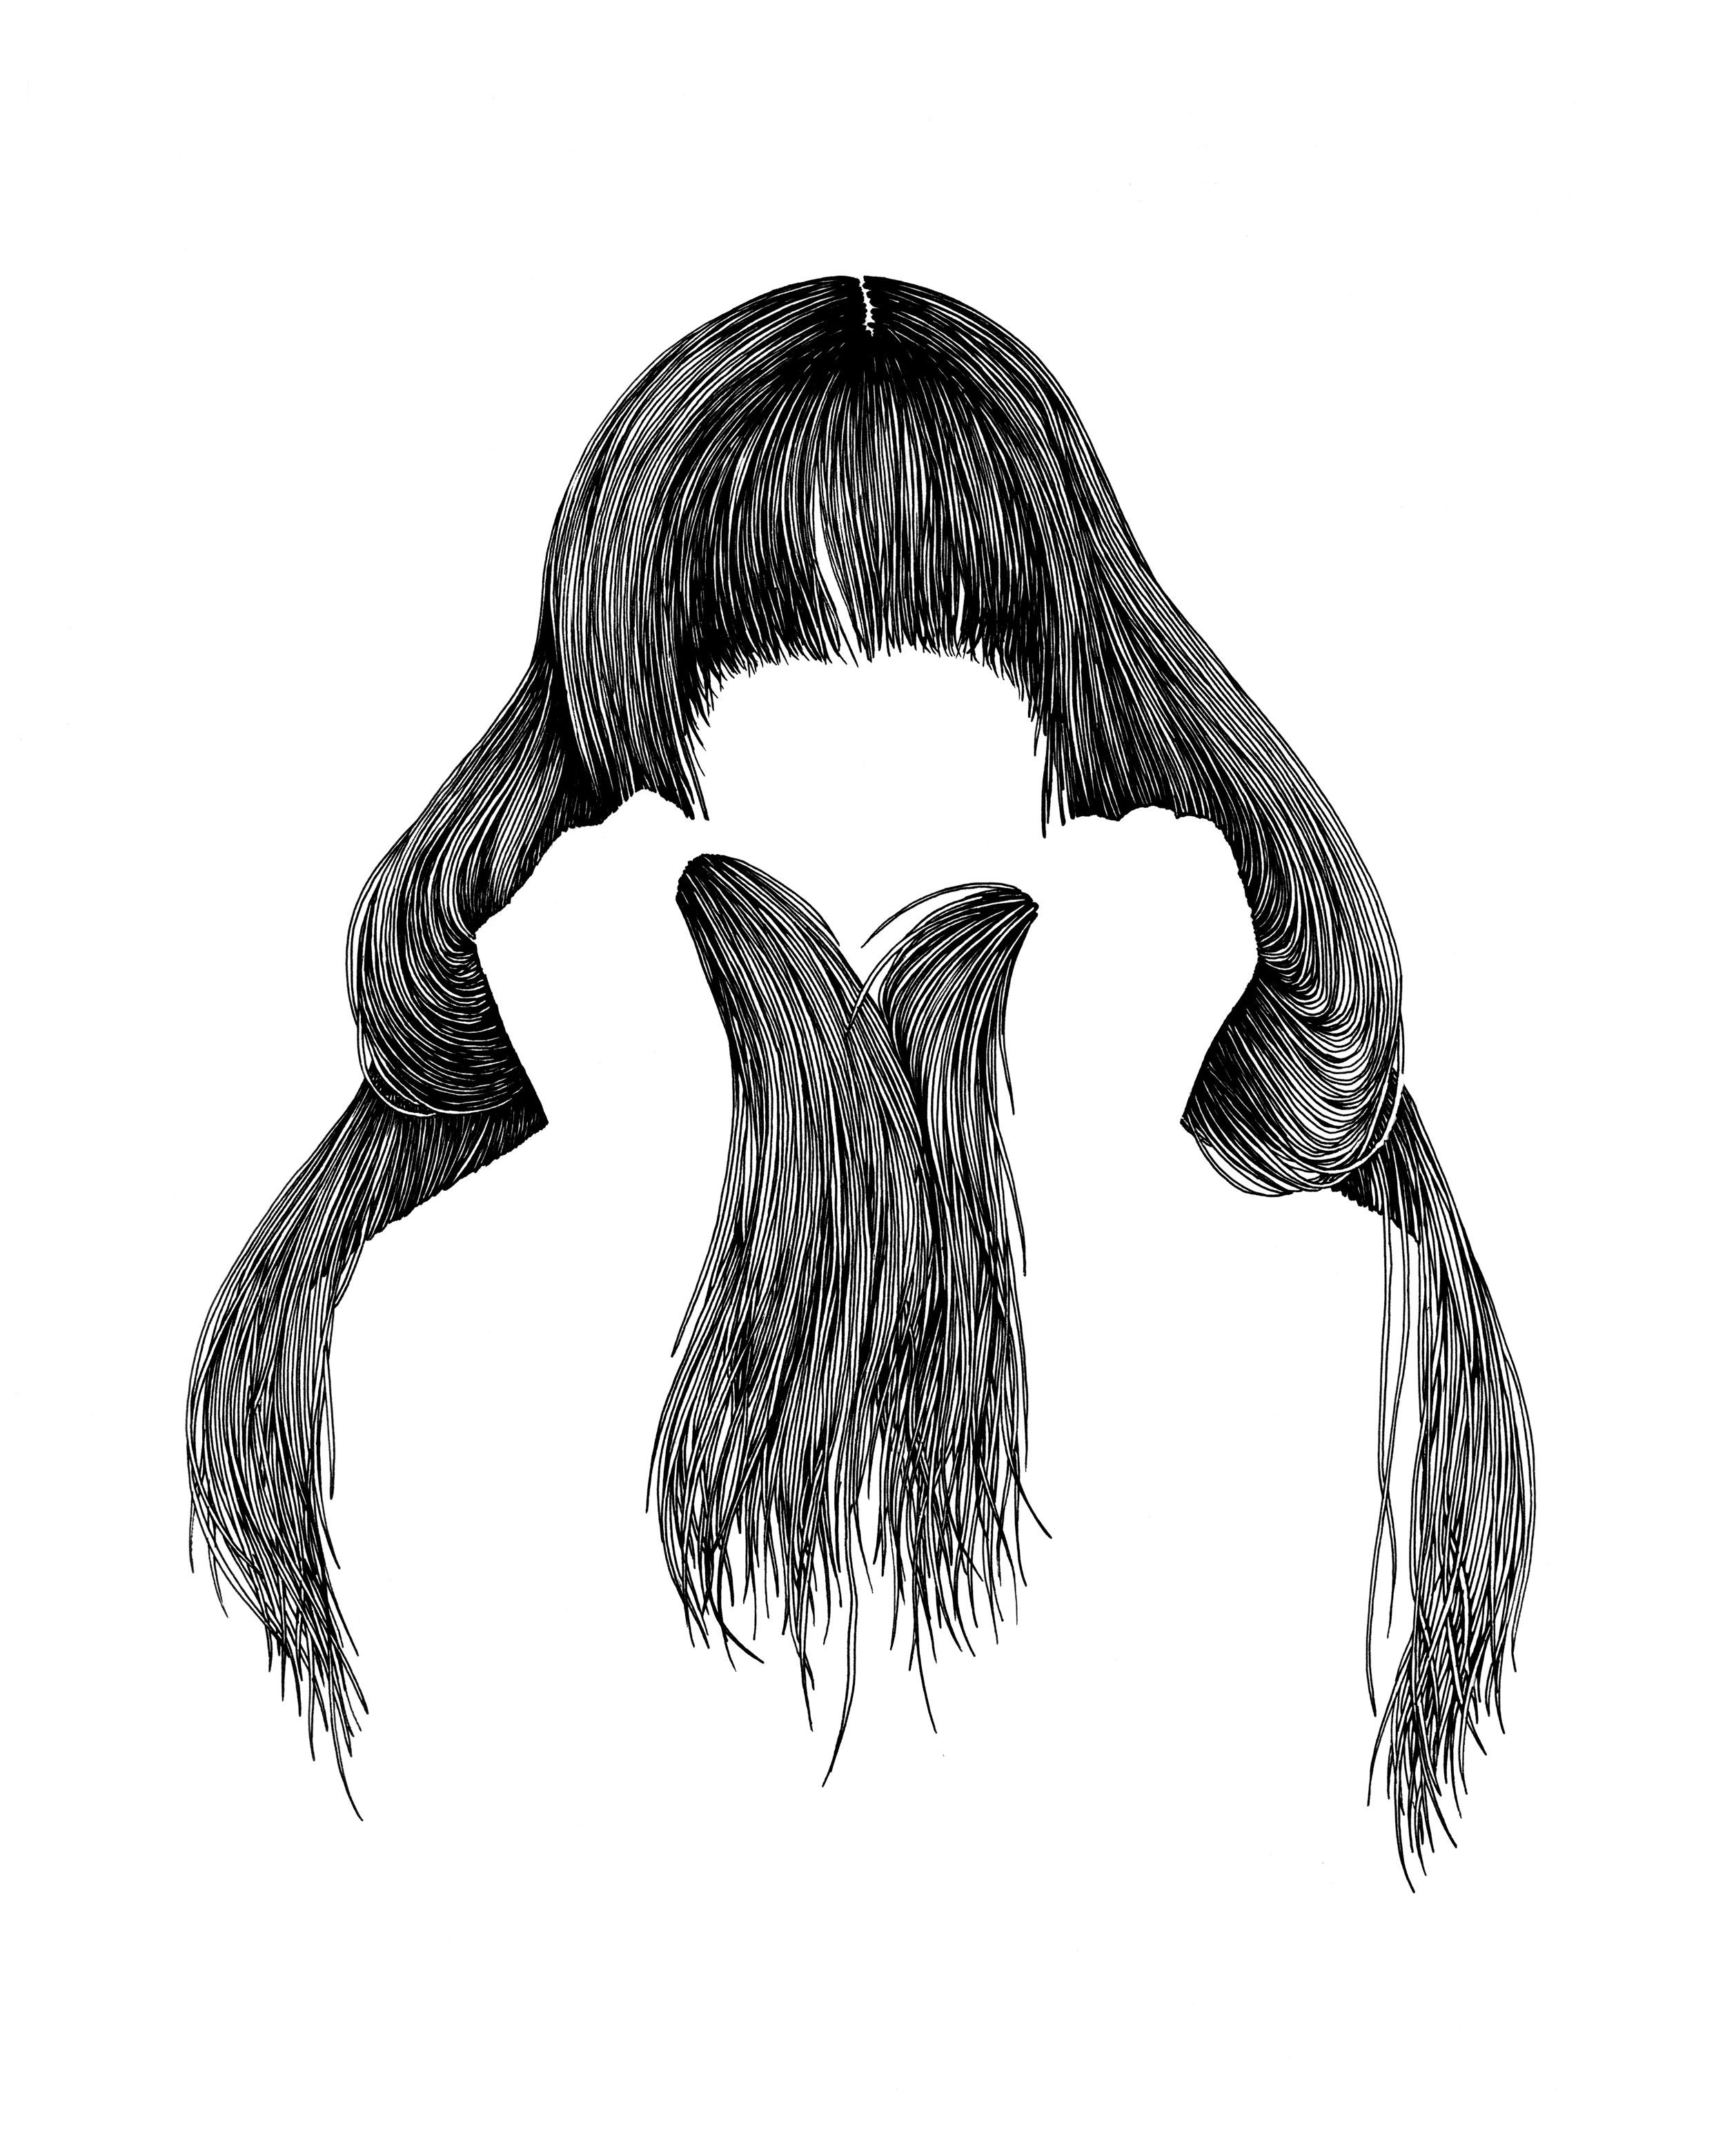 Hair 02 by simoneone